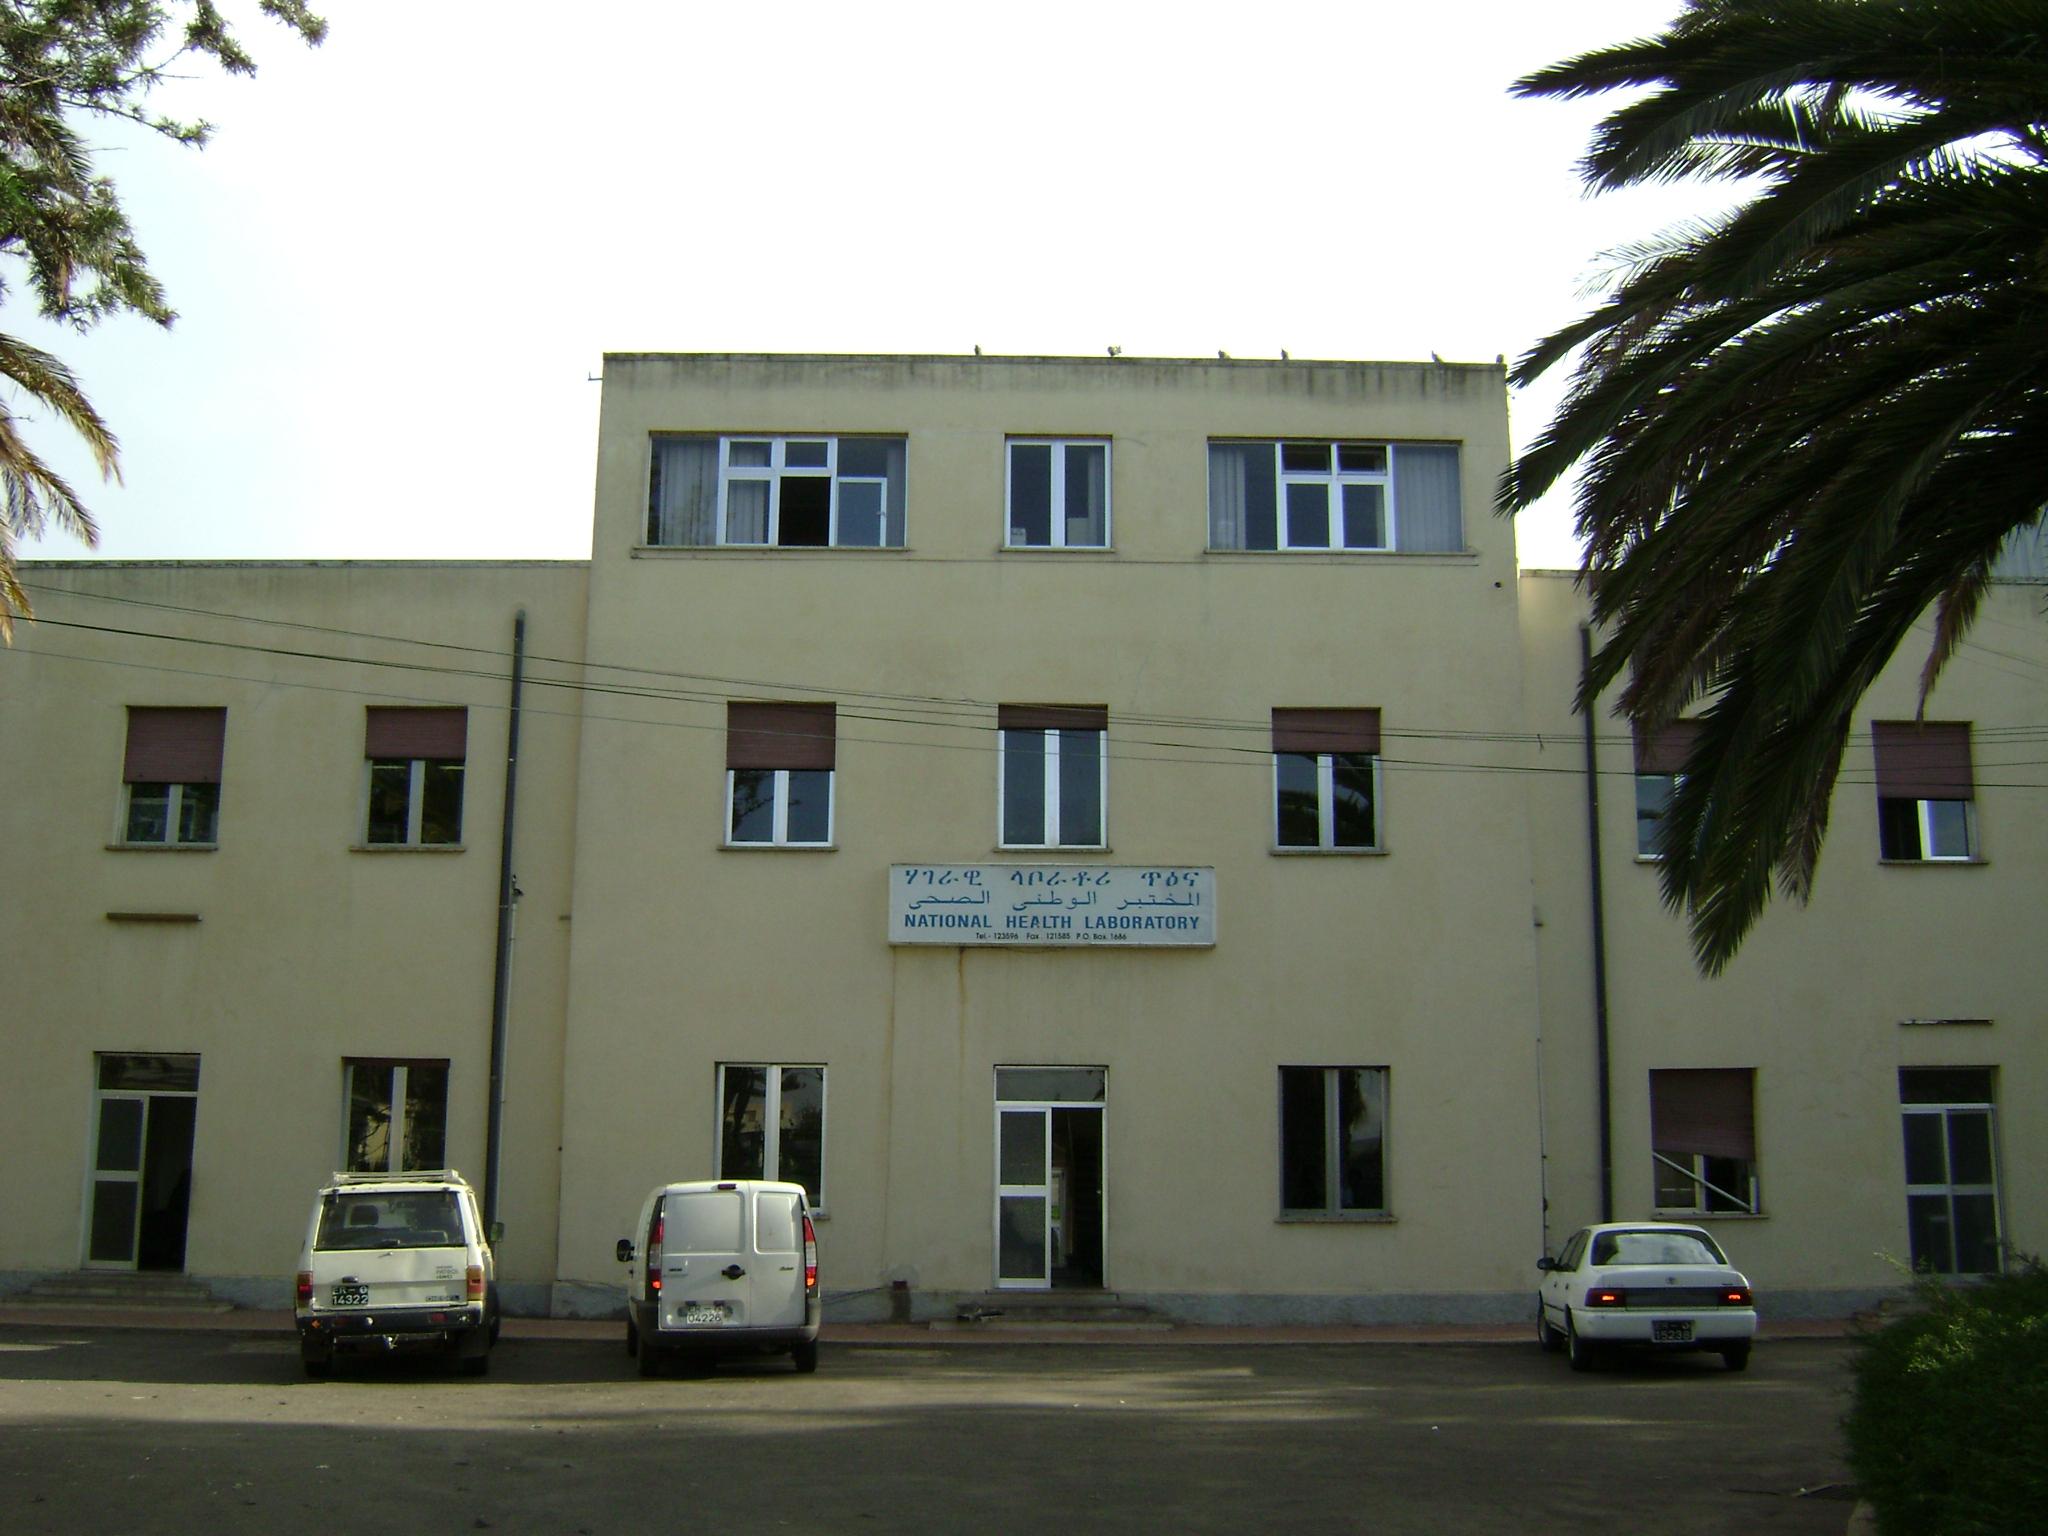 006_National Health Labs.JPG